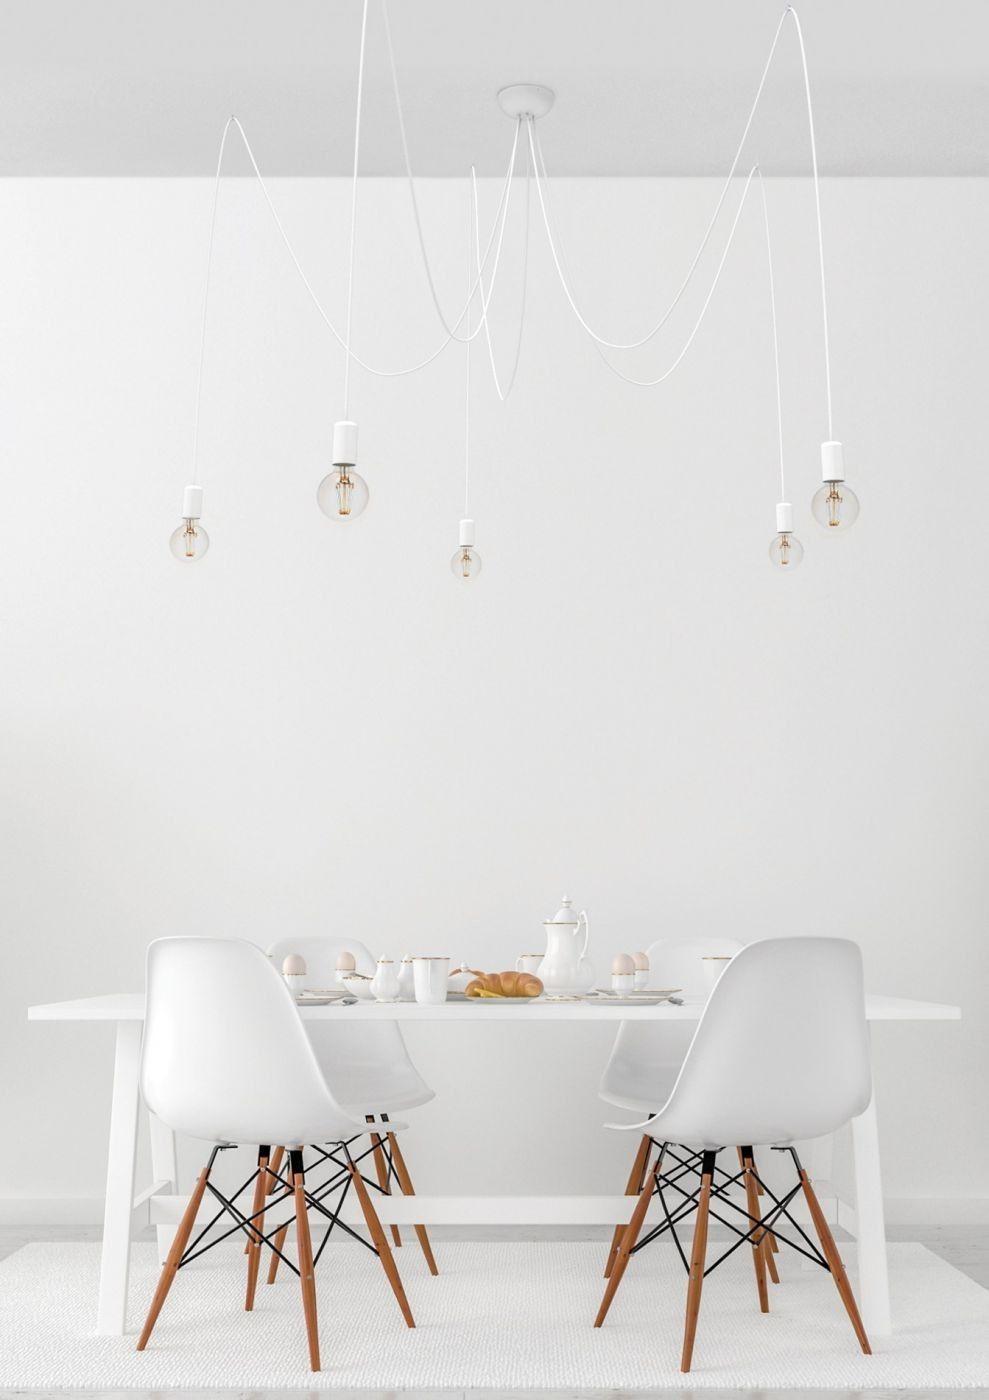 Spider White V 9744 - Nowodvorski - lampa pająk